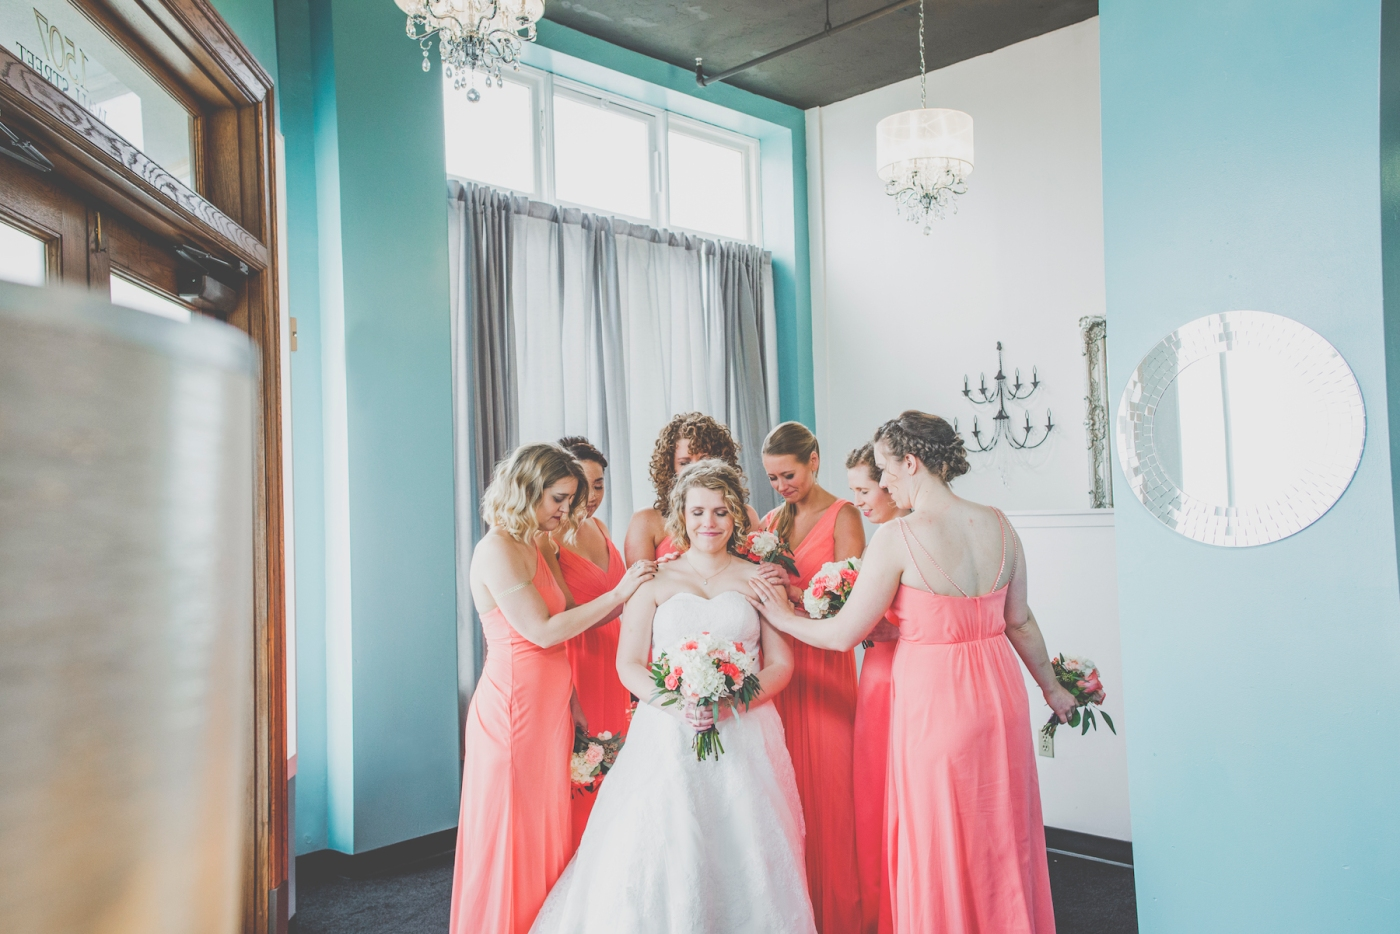 DSC_2465Everett_Wedding_Ballroom_Jane_Speleers_photography_Rachel_and_Edmund_Praying_2017